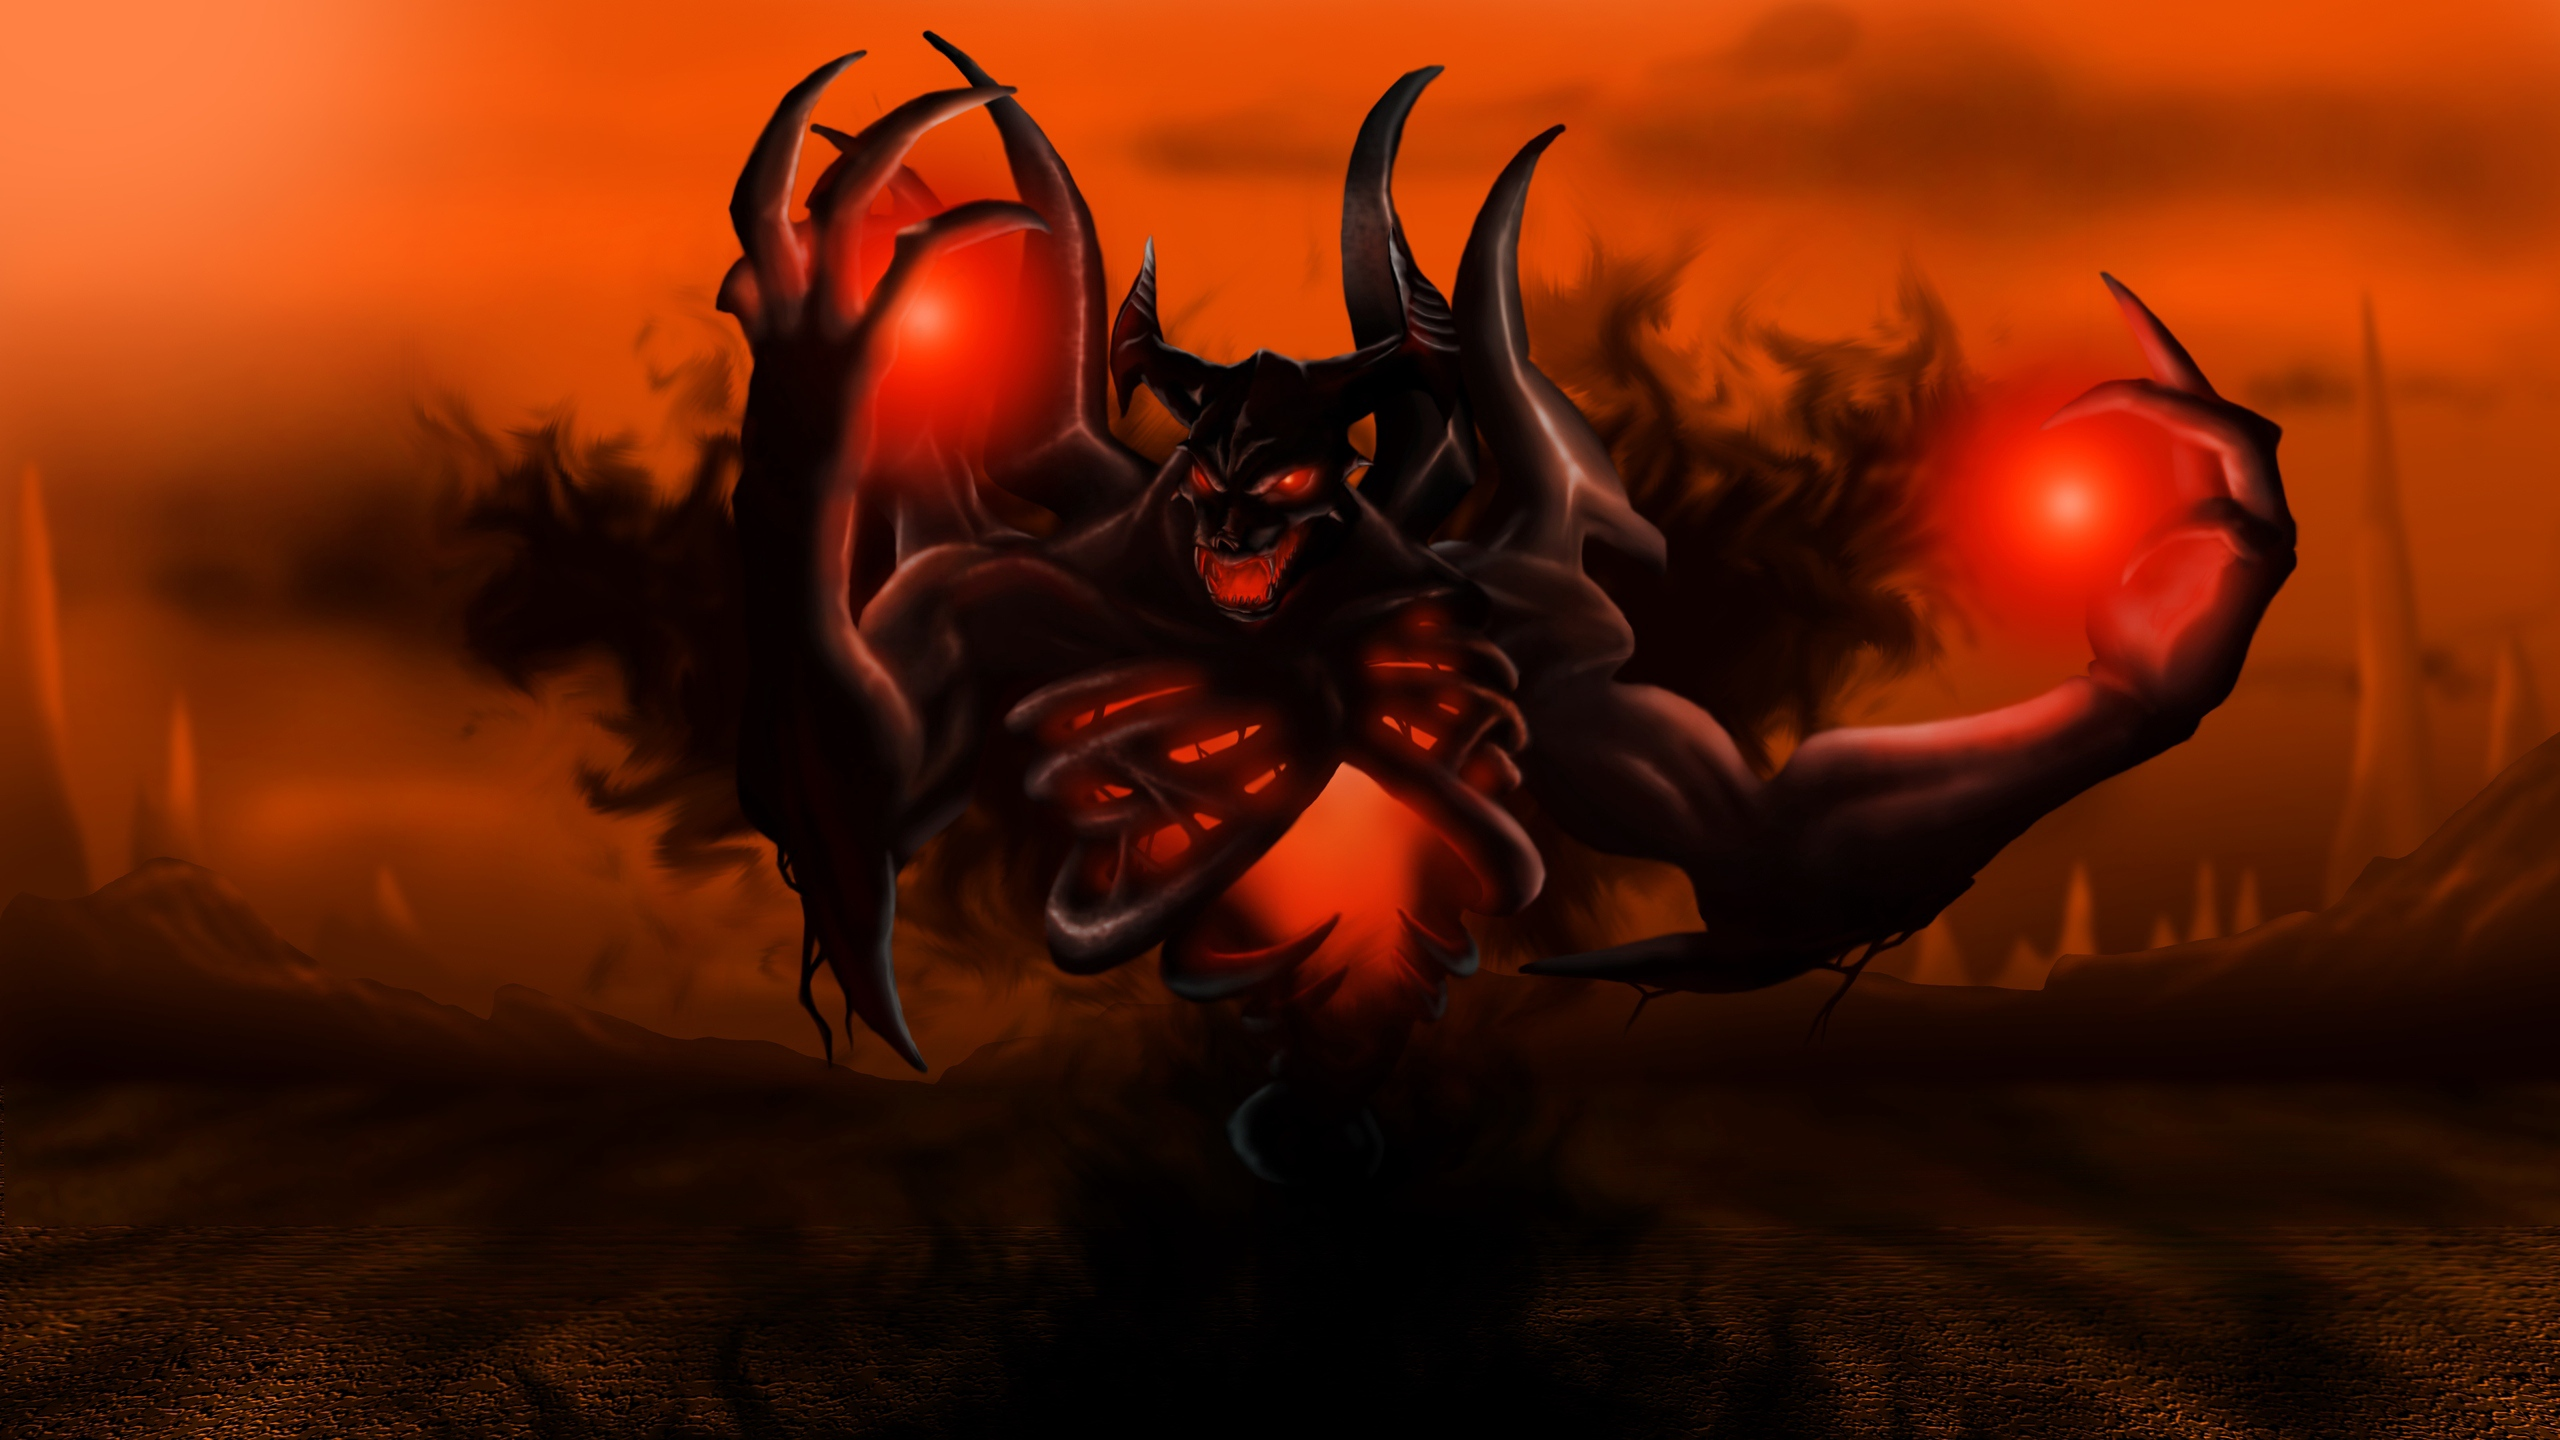 Download wallpaper 2560x1440 nevermore shadow fiend dota 2 hd 2560x1440